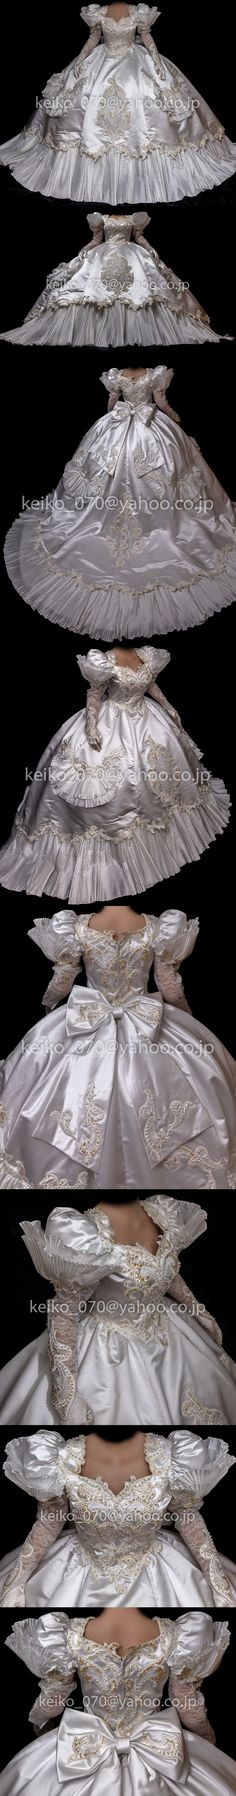 Fairy Wedding Dress, New Wedding Dresses, Amazing Dresses, Nice Dresses, Princess Wedding, Wedding Bride, Wedding Styles, Wedding Ideas, Casual Attire